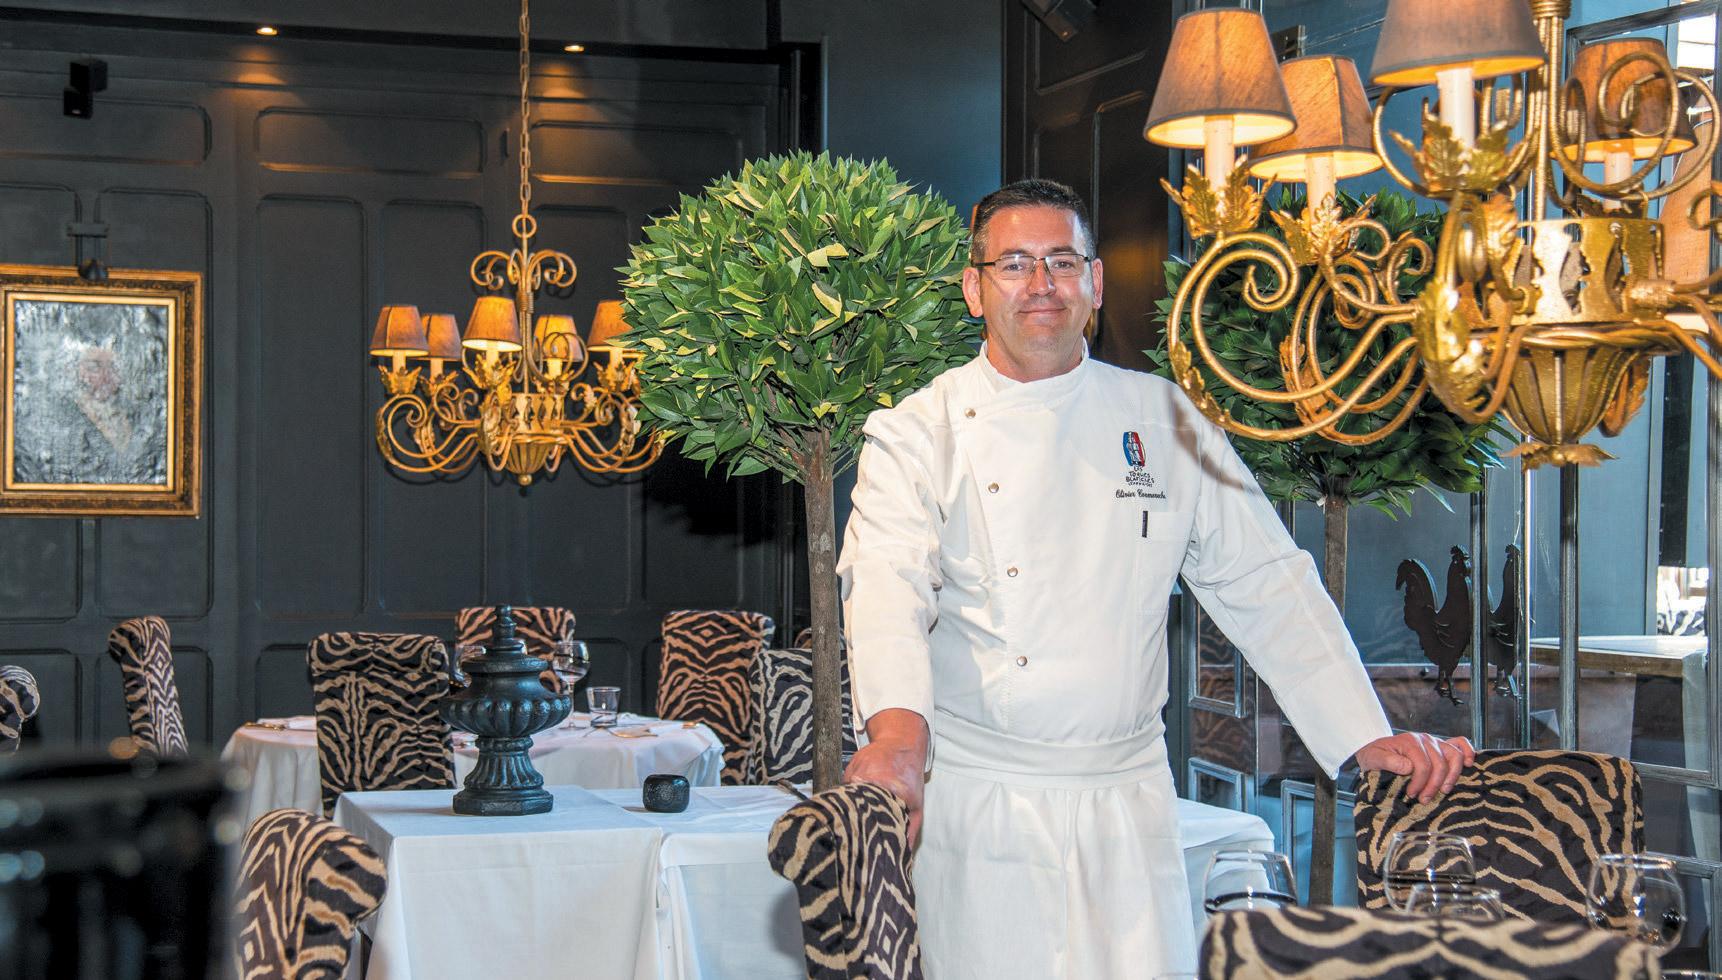 Restaurant Tour Cocooning et Gastronomie - Olivier Cormoreche